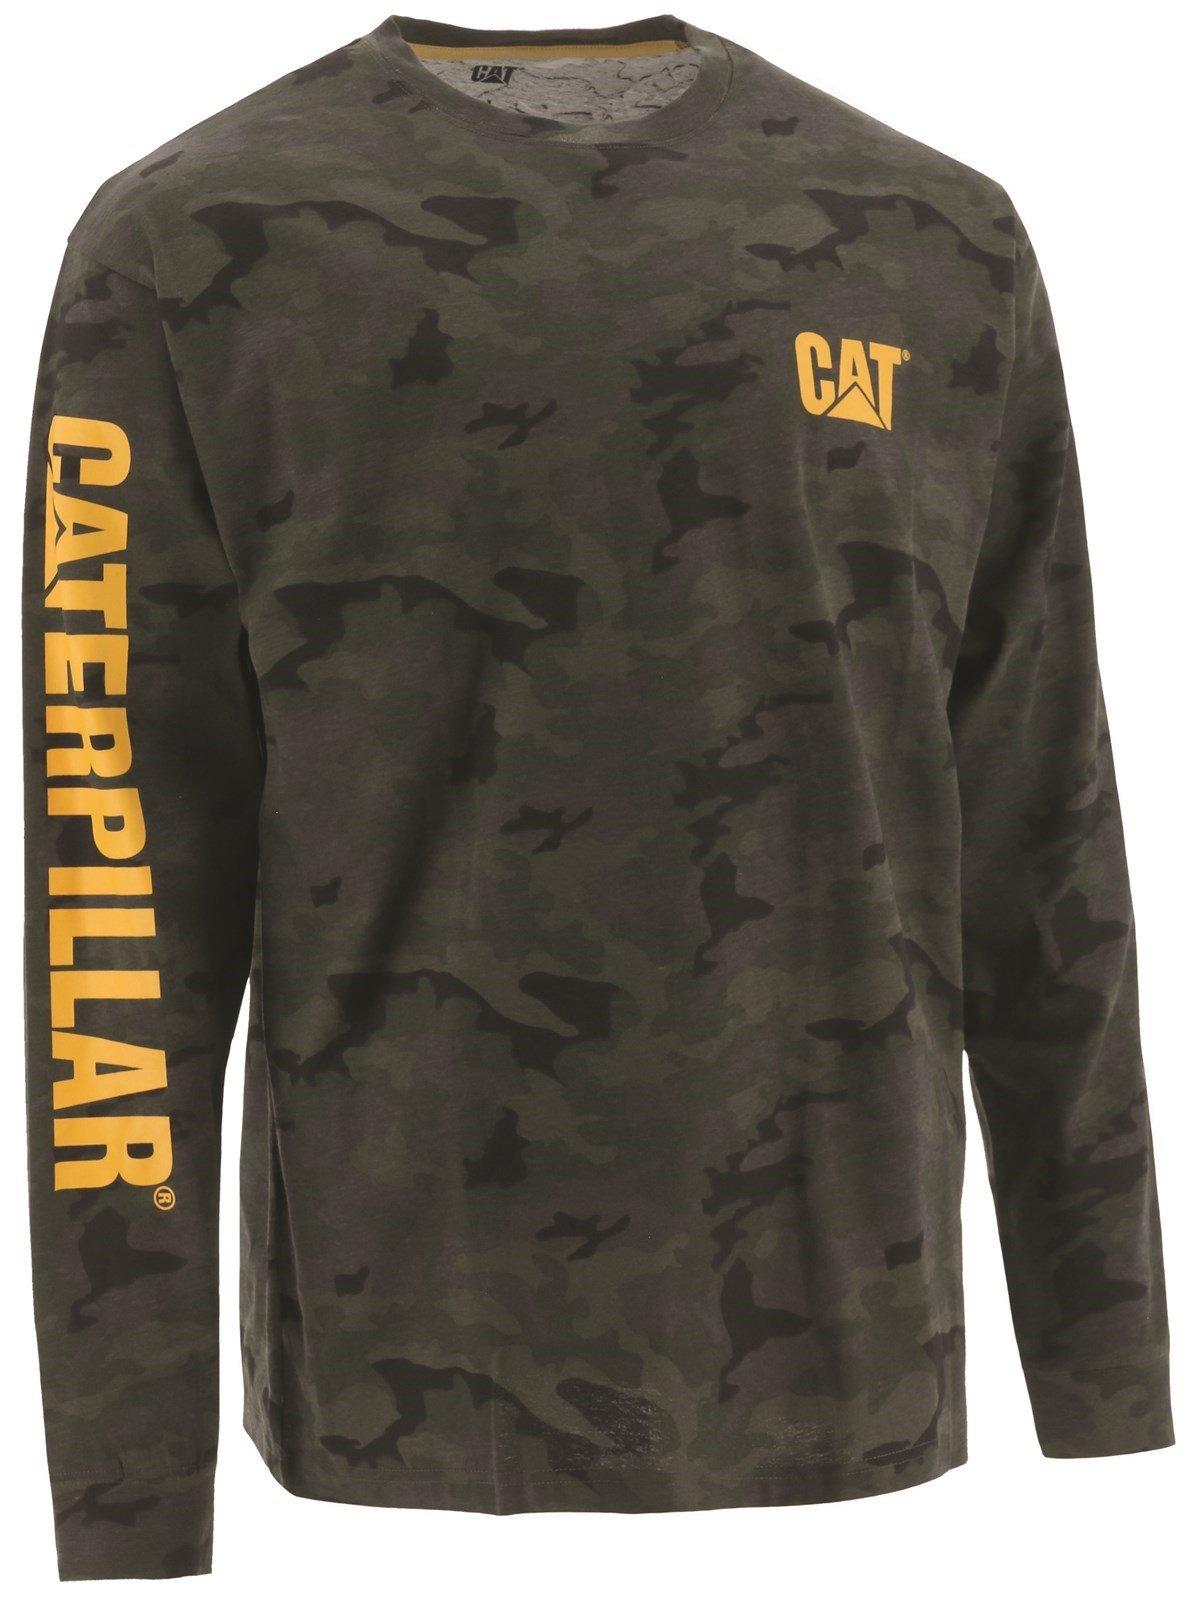 Caterpillar Unisex Trademark Banner LS T-Shirts Night Camo 31681 - Night Camo Sml